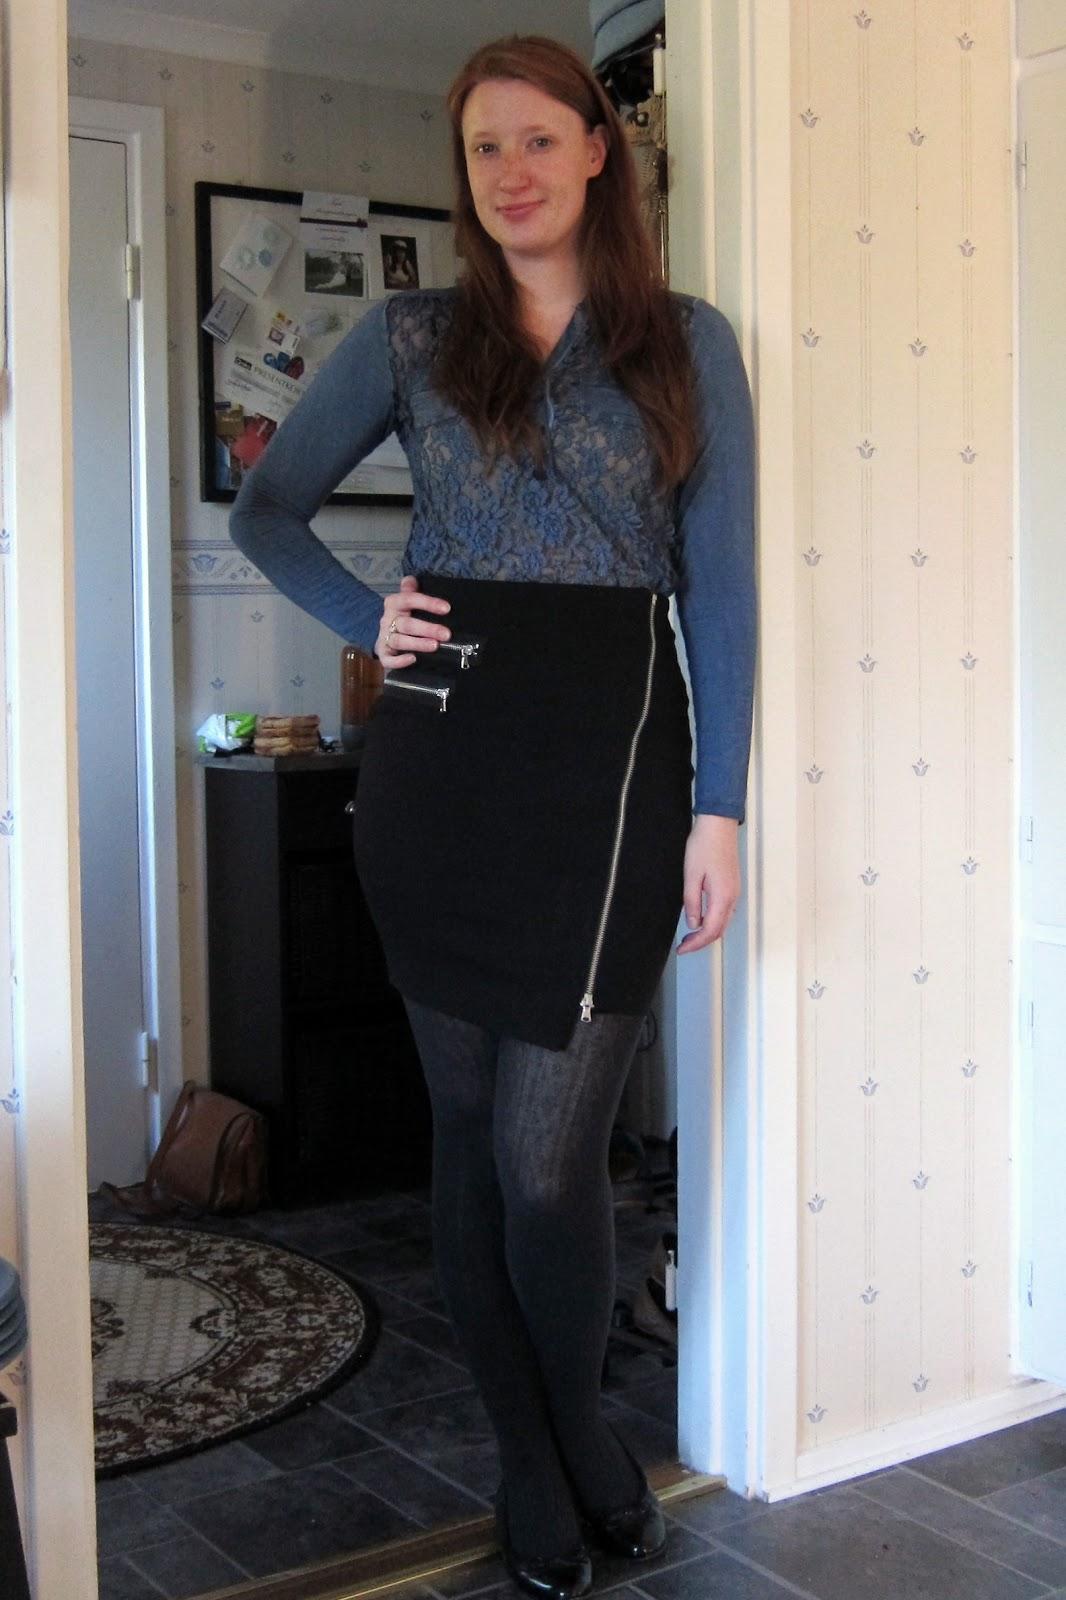 Ur min garderob: Utblidningssnygg